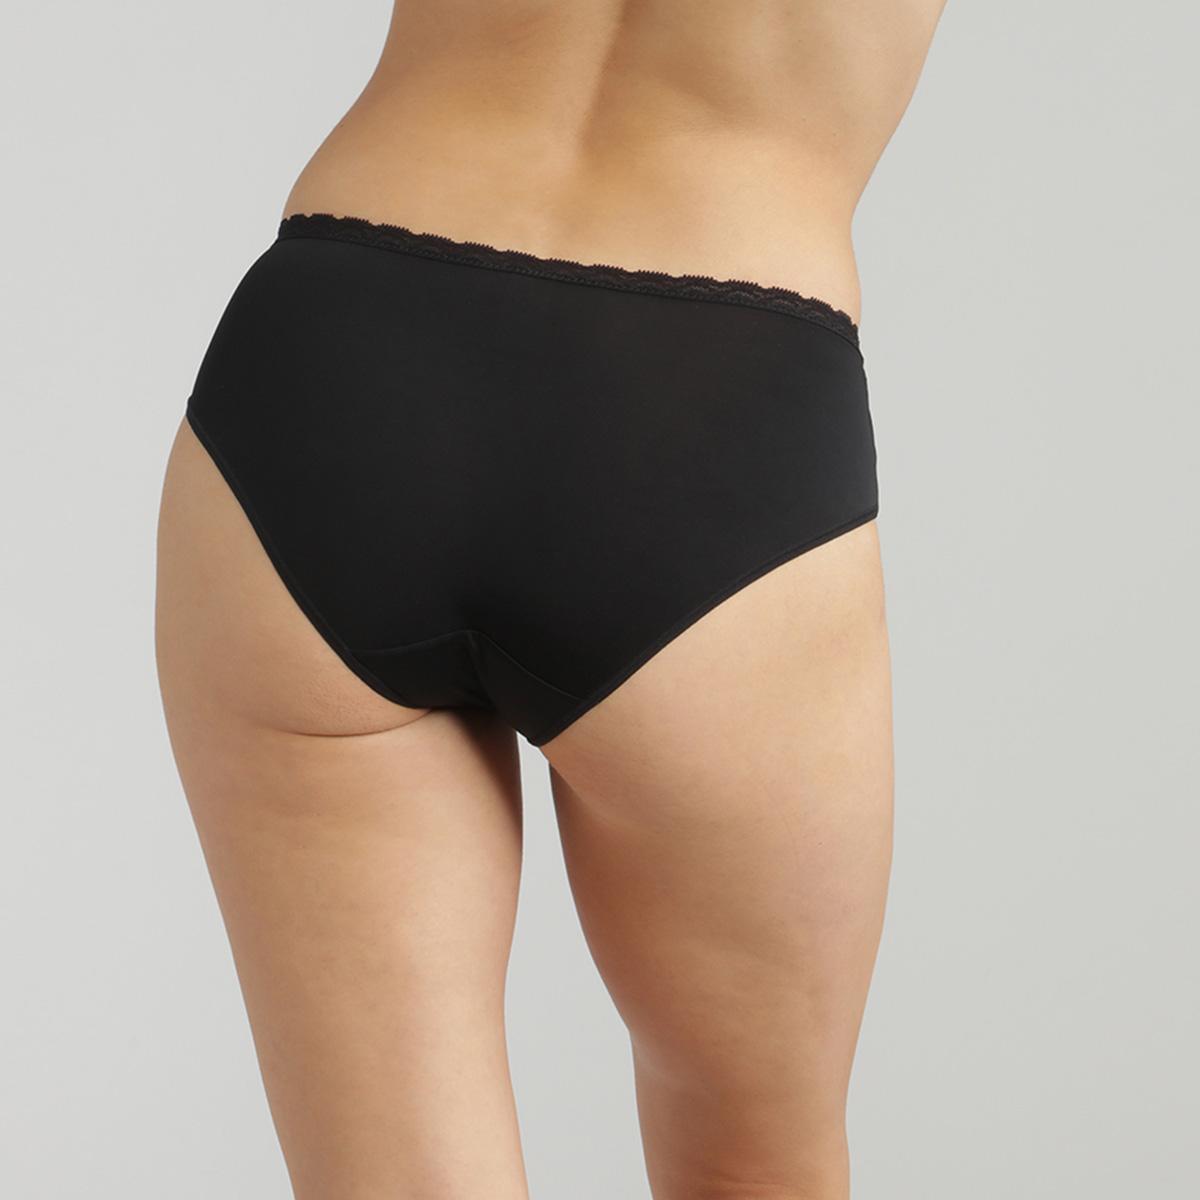 Culotte midi dentelle noire Ideal Posture, , PLAYTEX